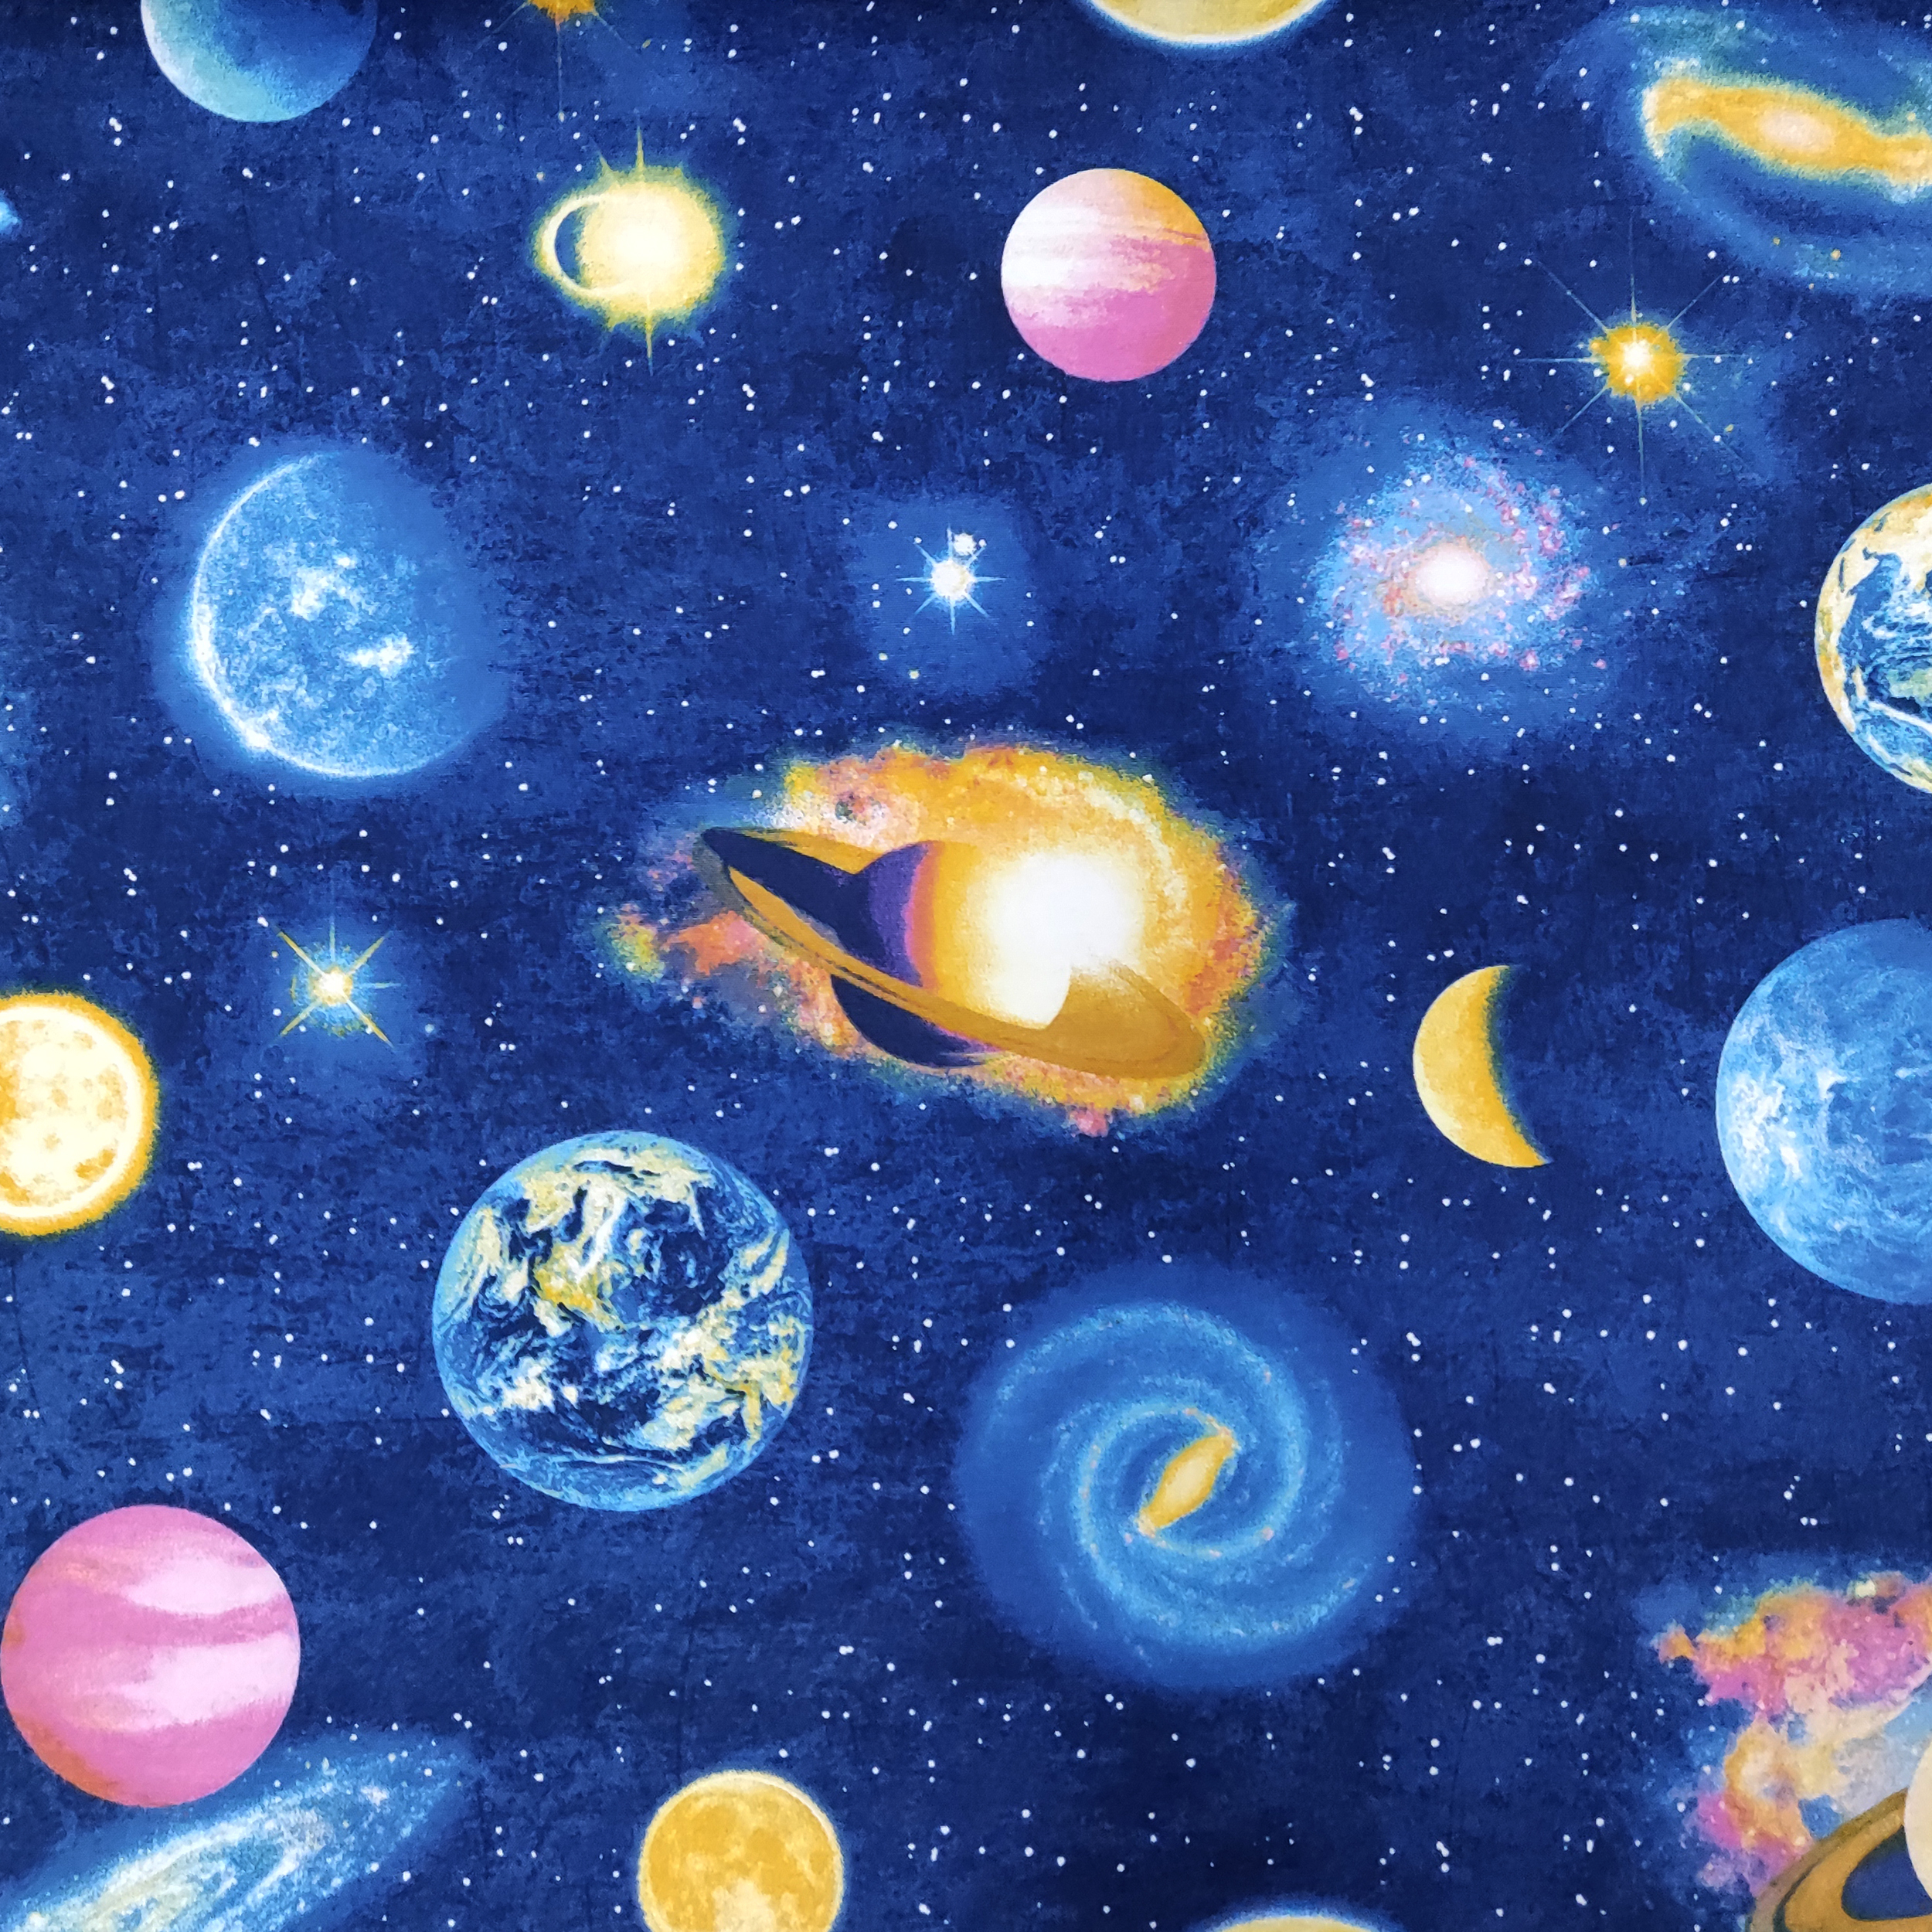 Tessuto-Misto-Cotone-Fantasia-Sistema-Solare